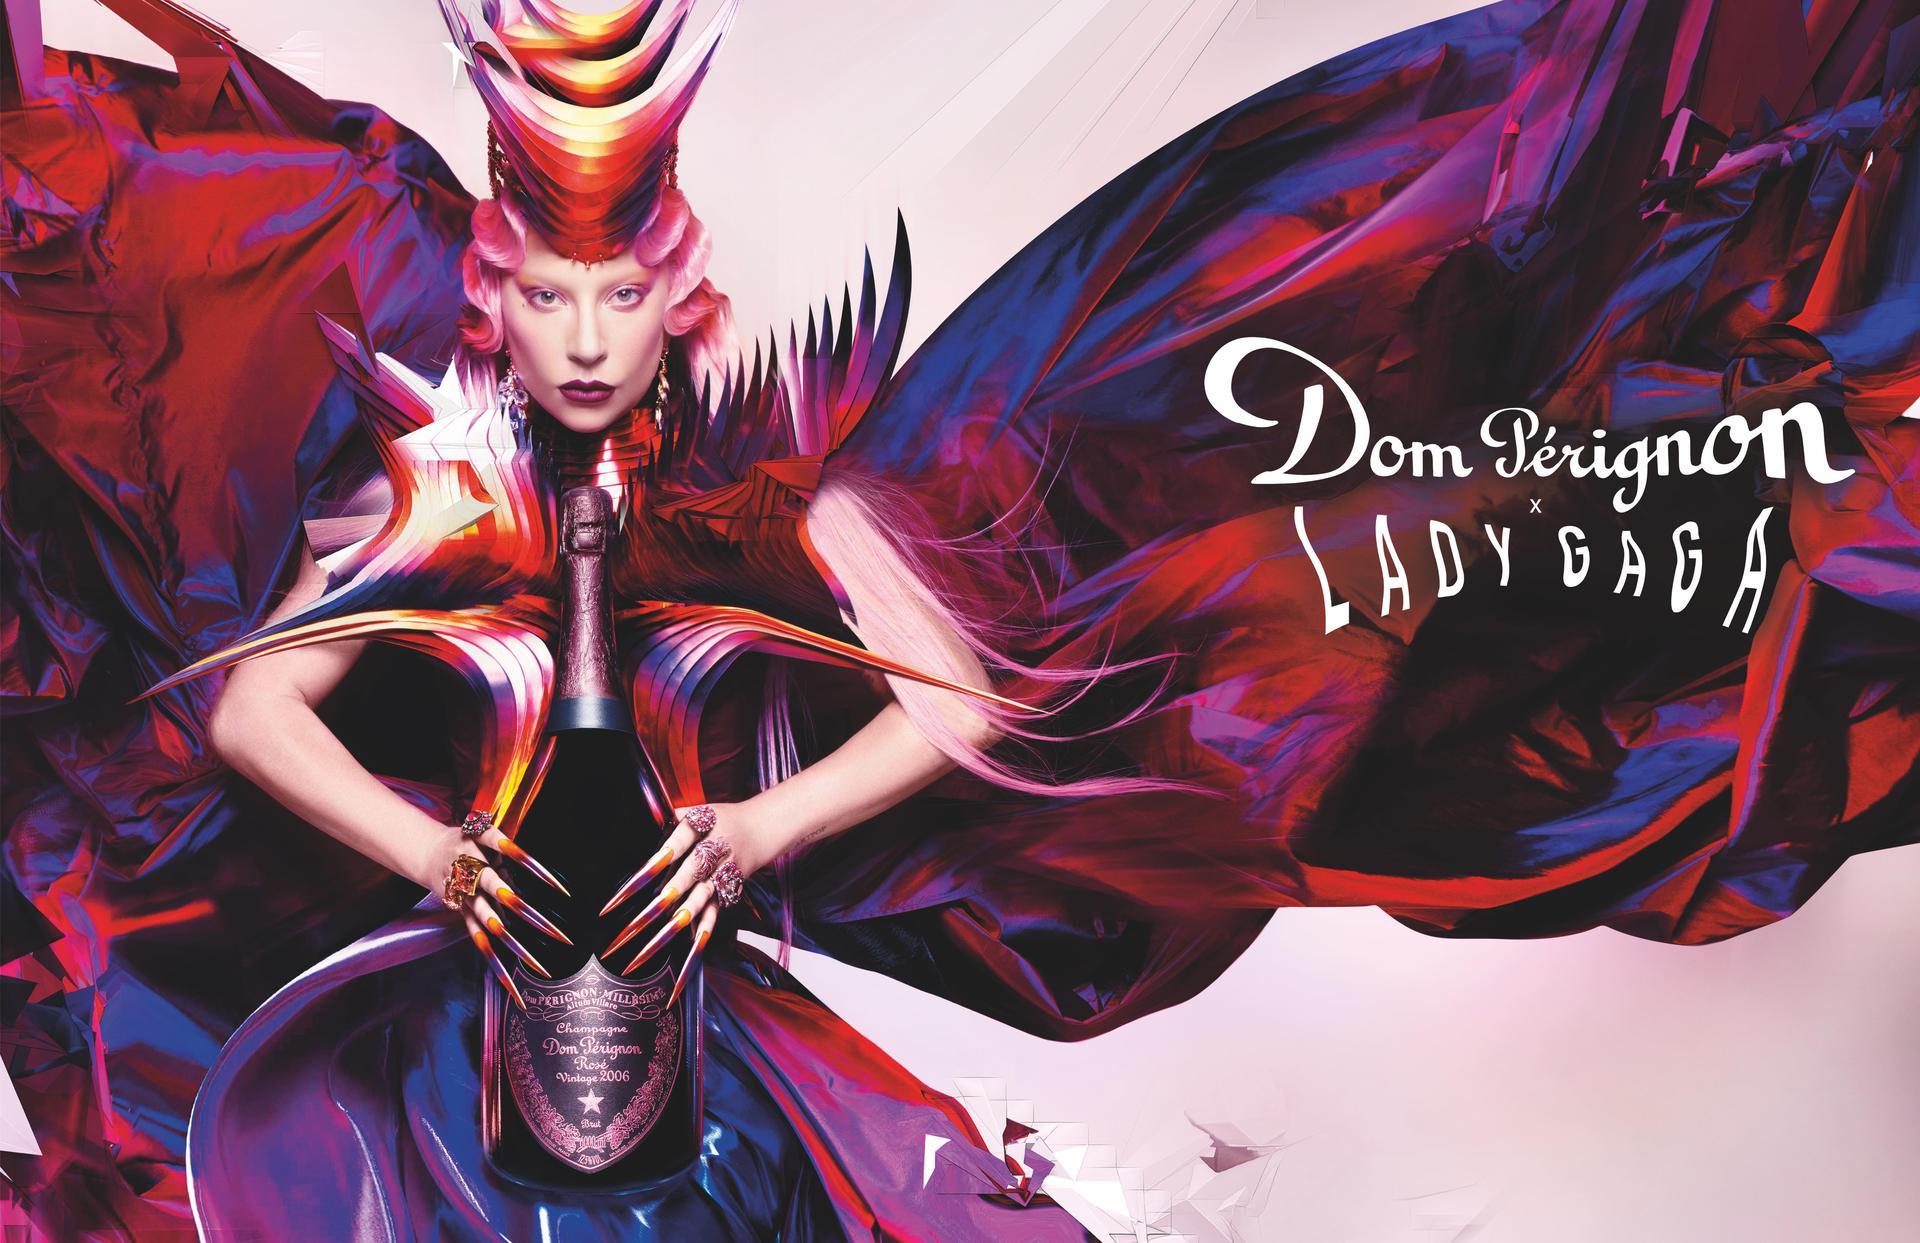 Dom Perignon x Lady Gaga